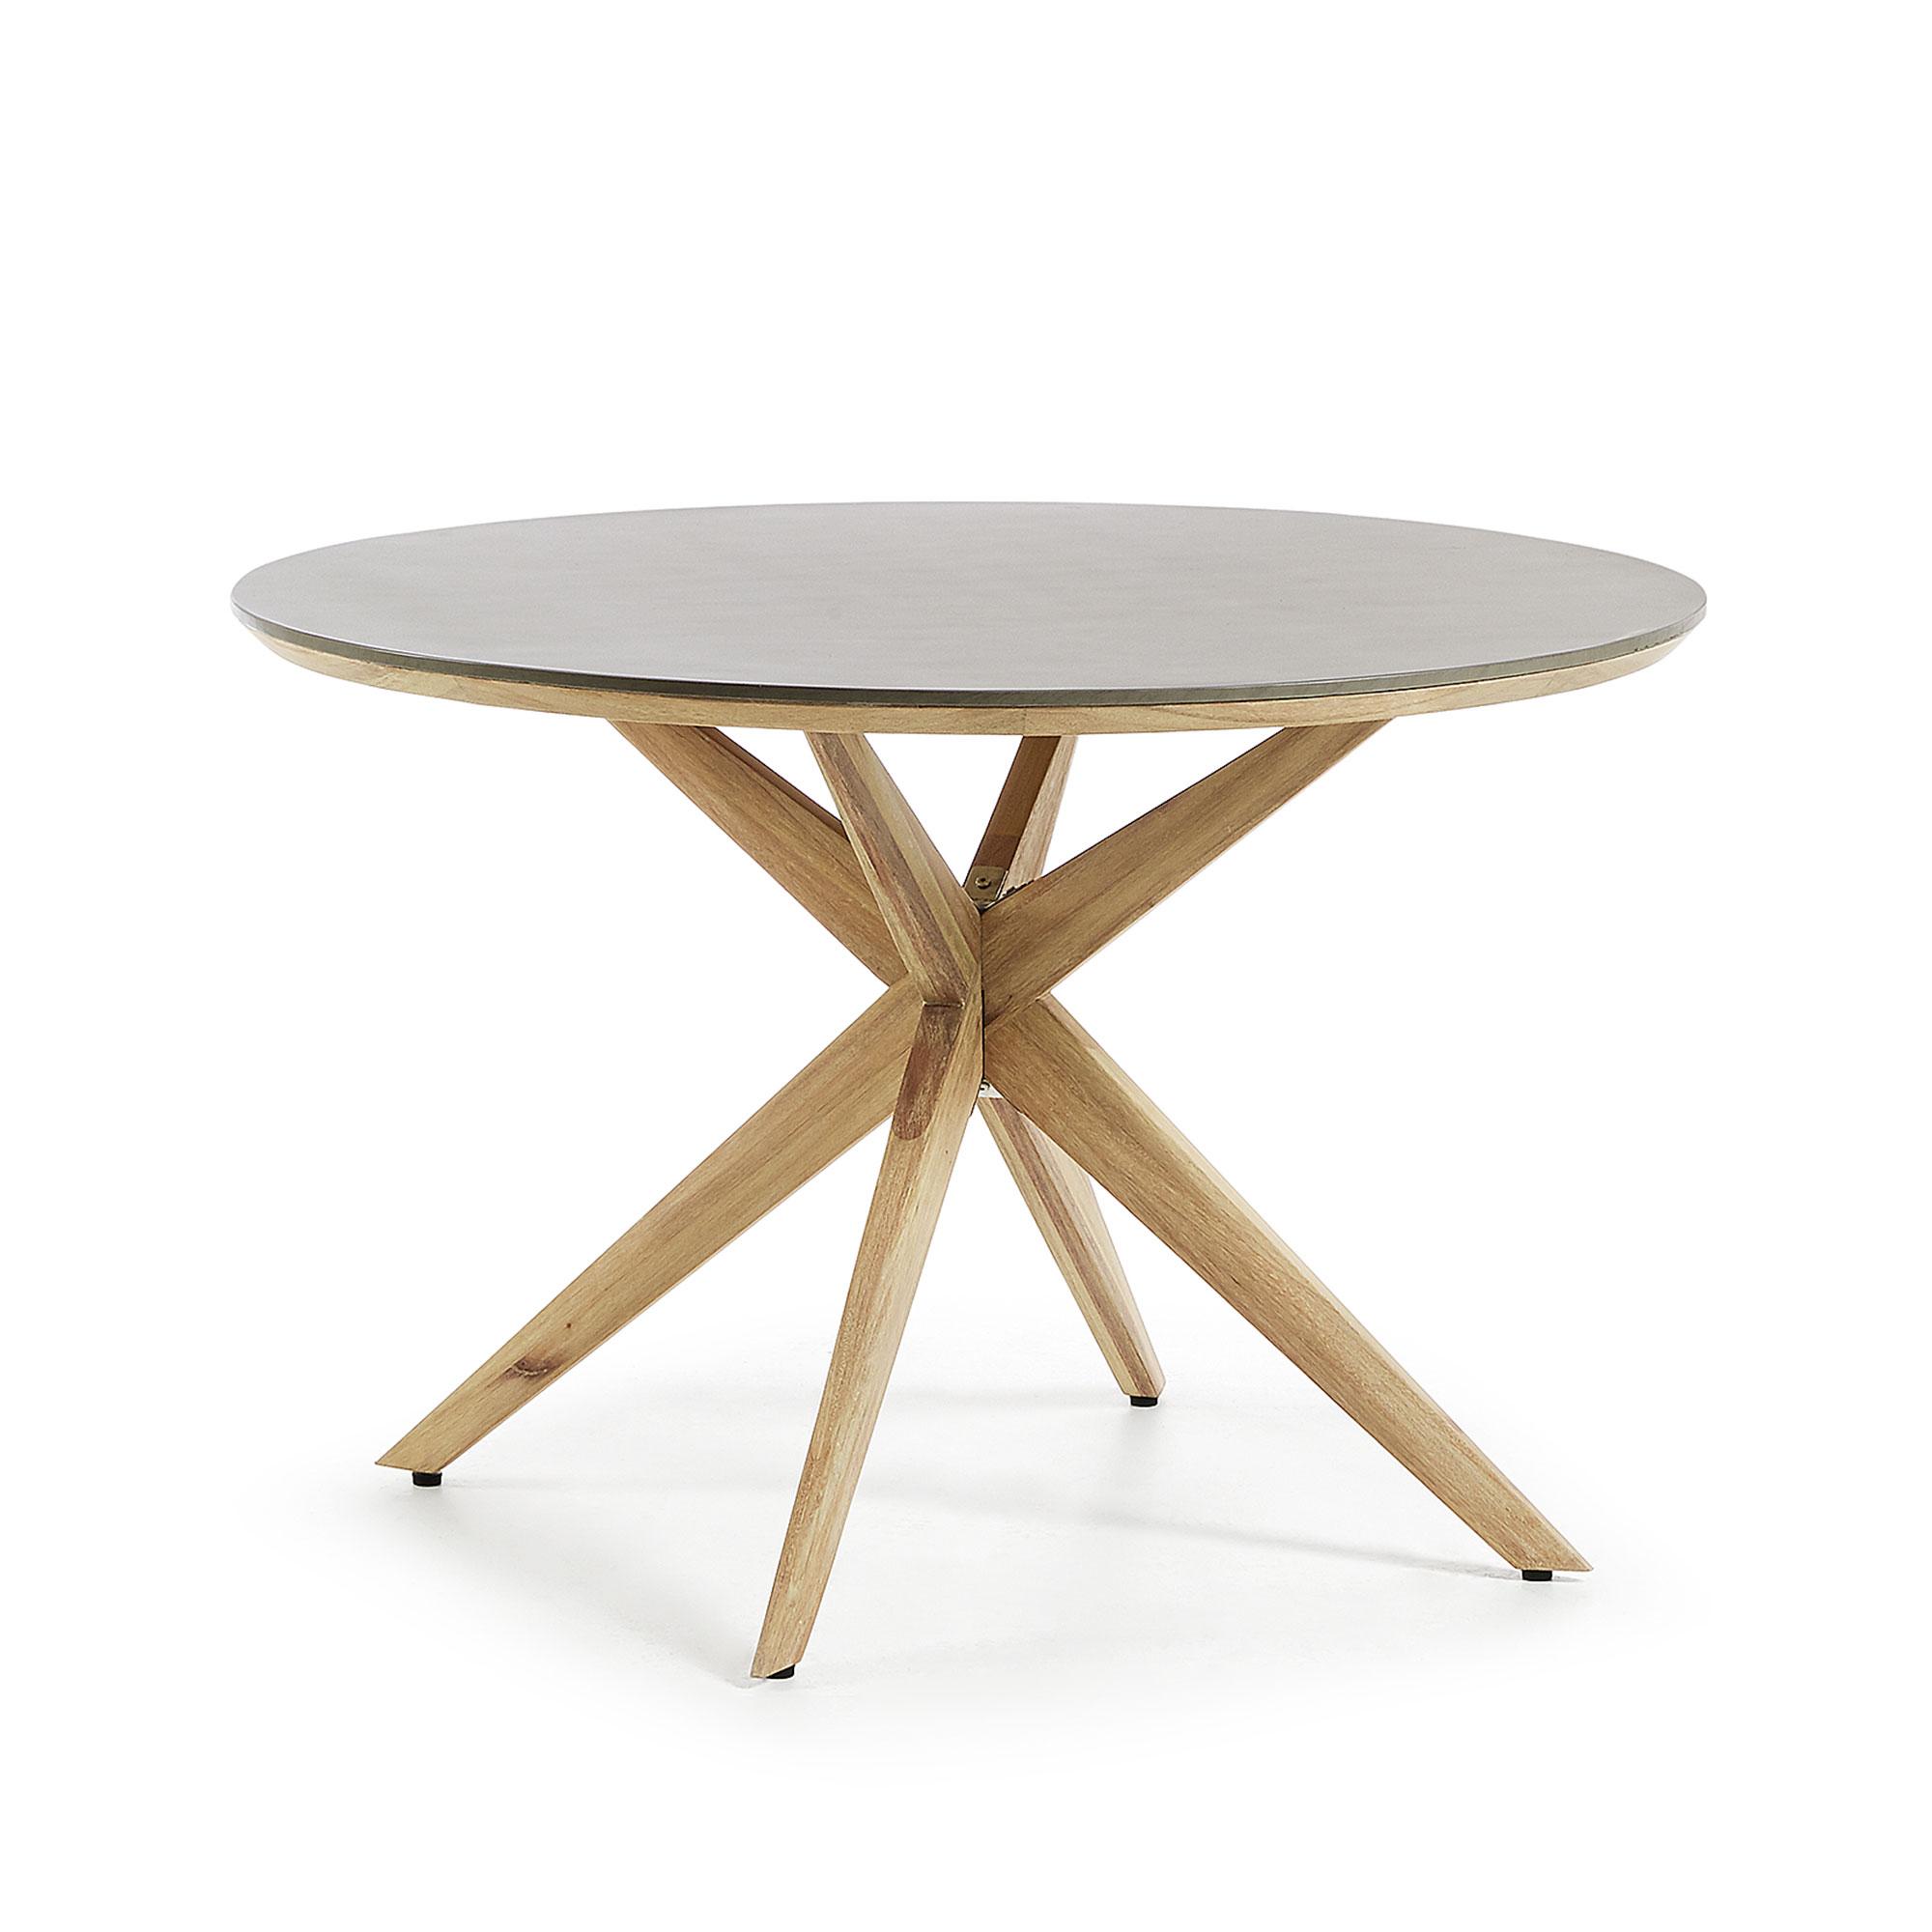 LAFORMA Glow spisebord - lysegrå/natur polycement/eukalyptusttræ, rund (Ø120)